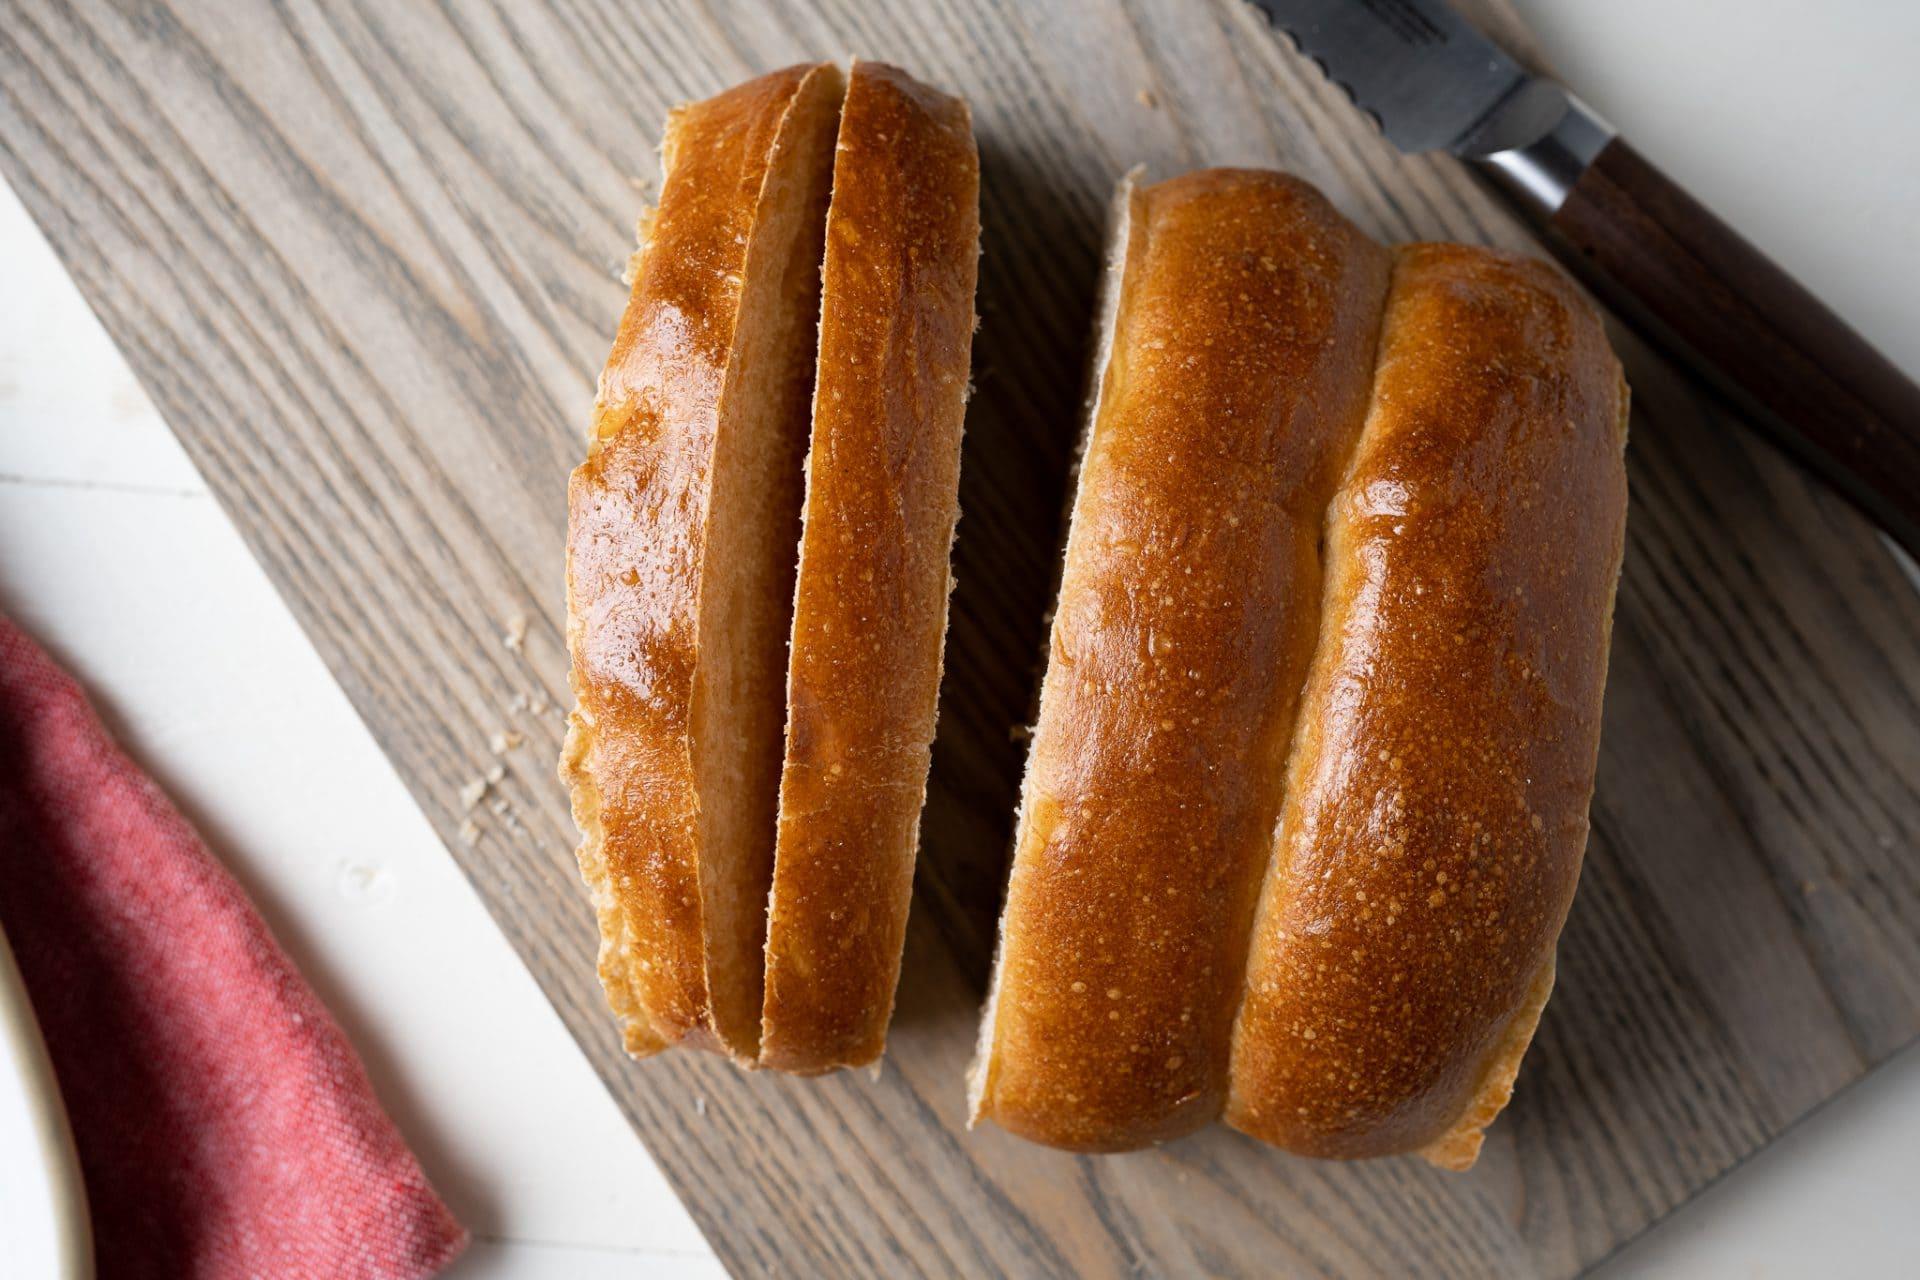 Homemade New England style hot dog buns